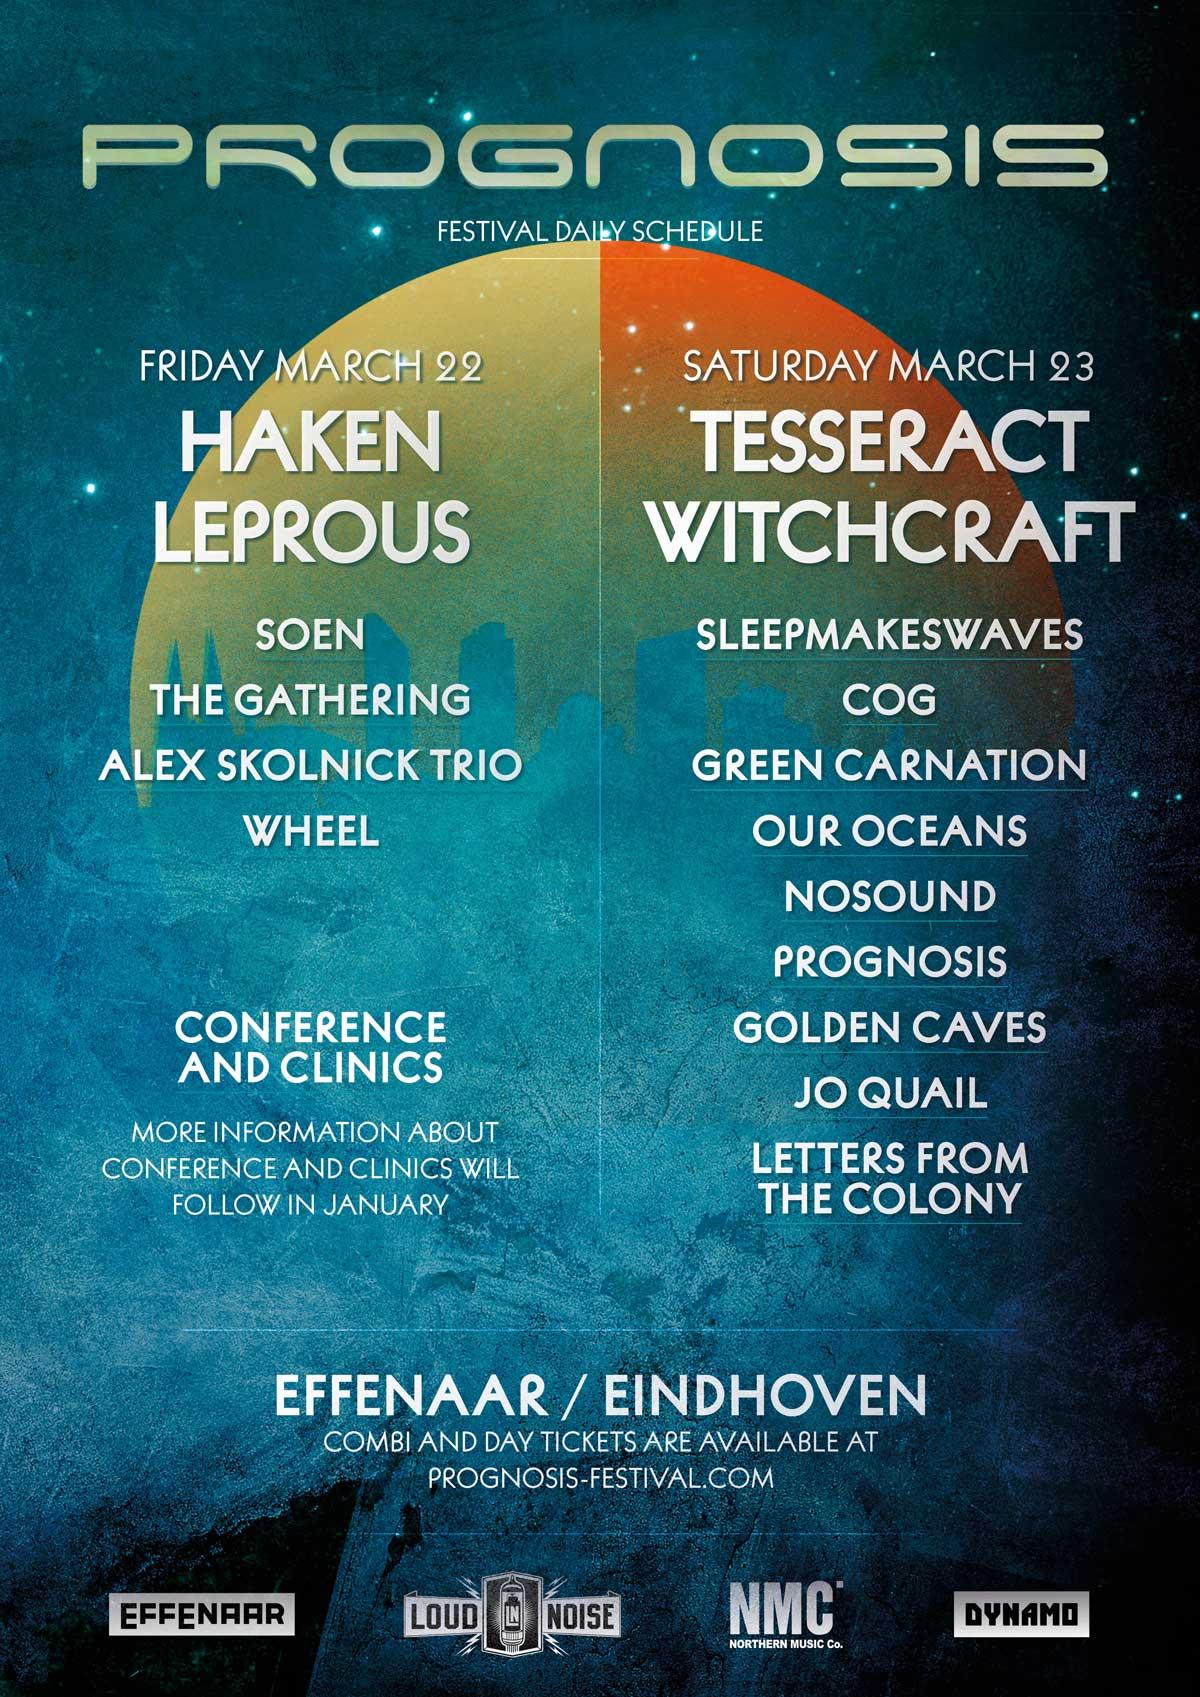 Prognosis Festival - Eindhoven, Netherlands